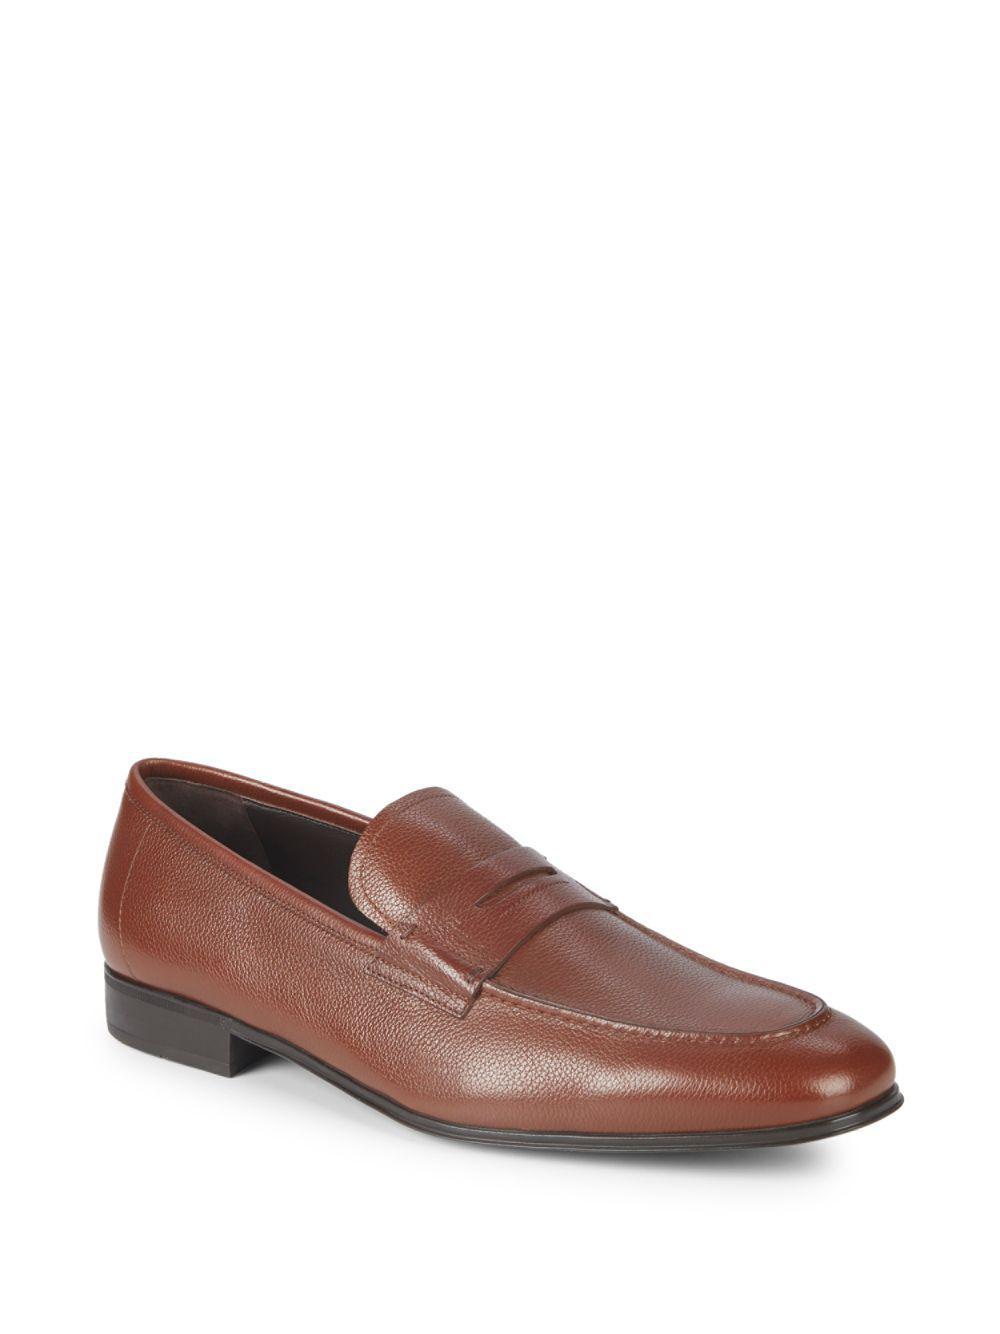 Lyst Ferragamo Fiorino Leather Penny Loafers In Brown For Men